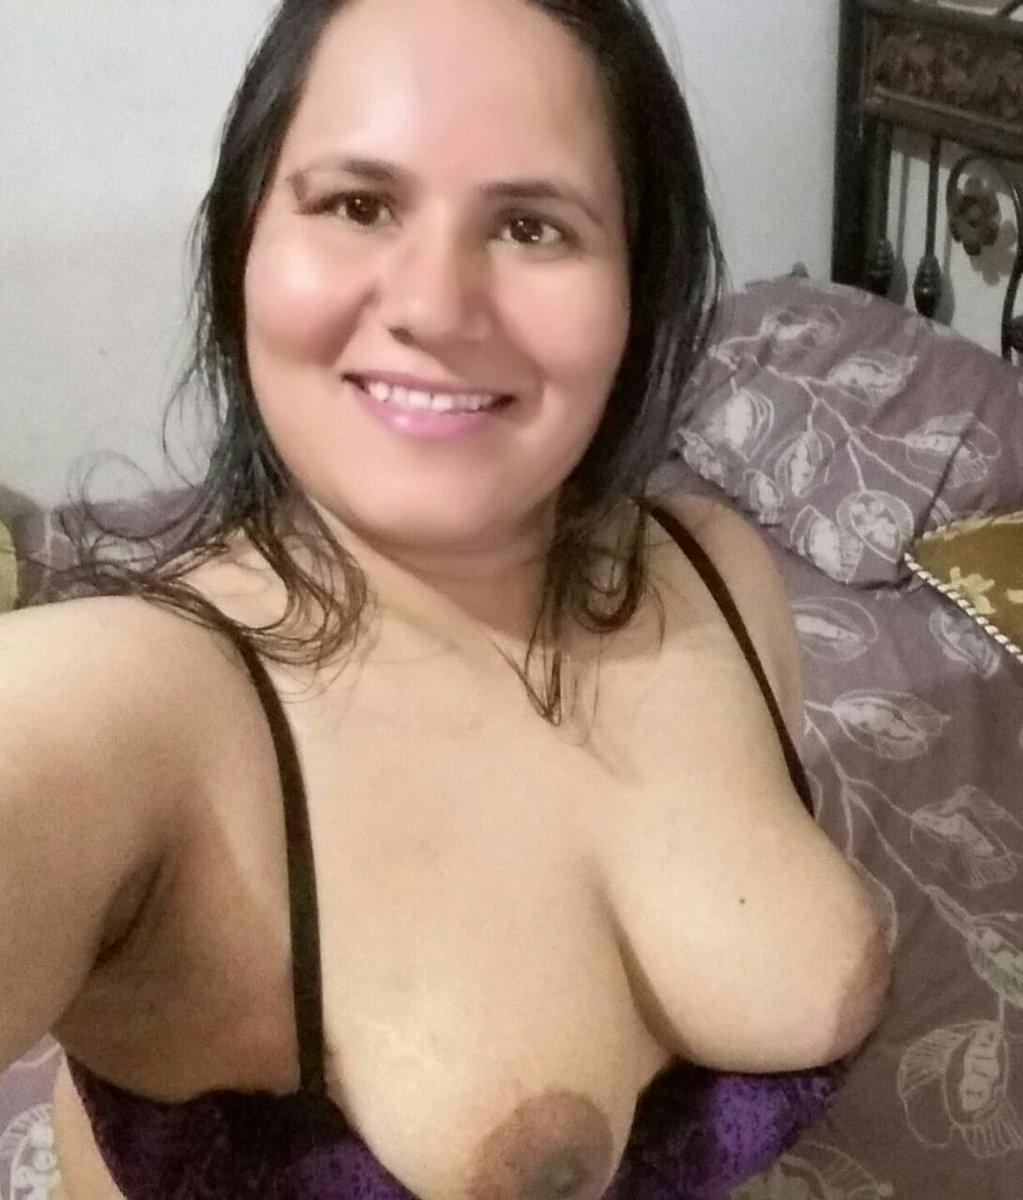 Nude Selfie 10173